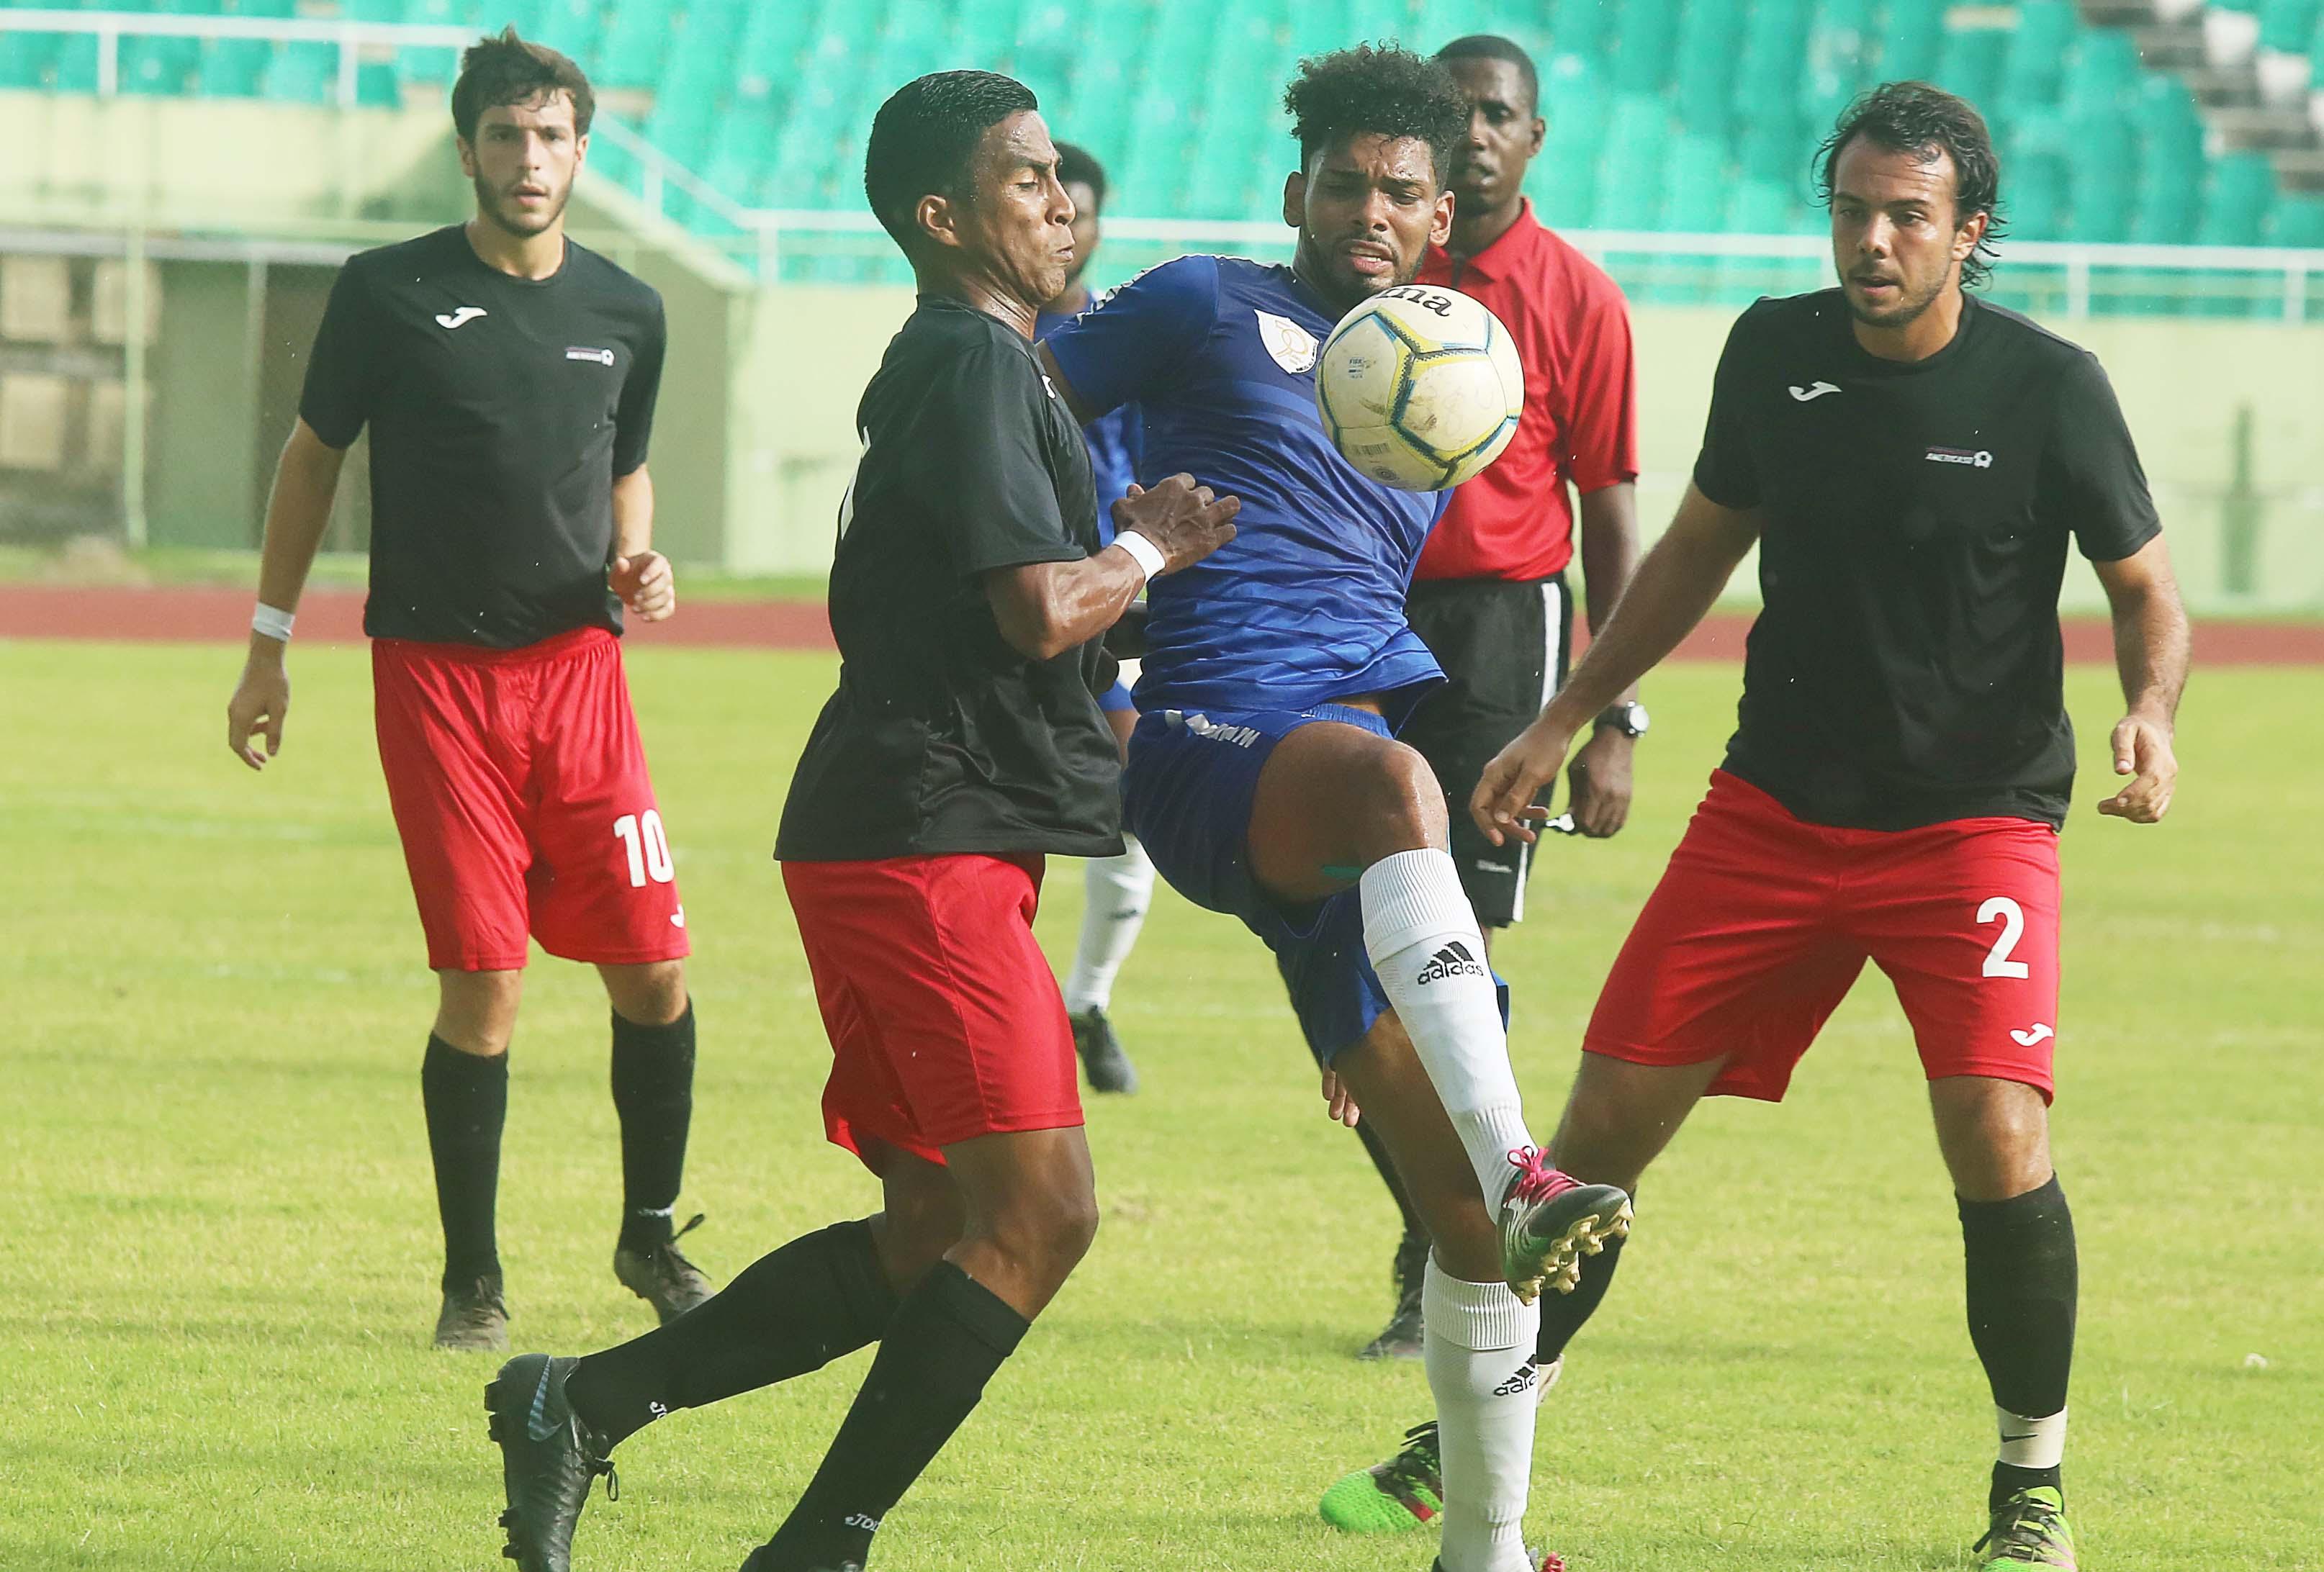 Oncenos pretenden cruzar a la final torneo Serie B de Fútbol